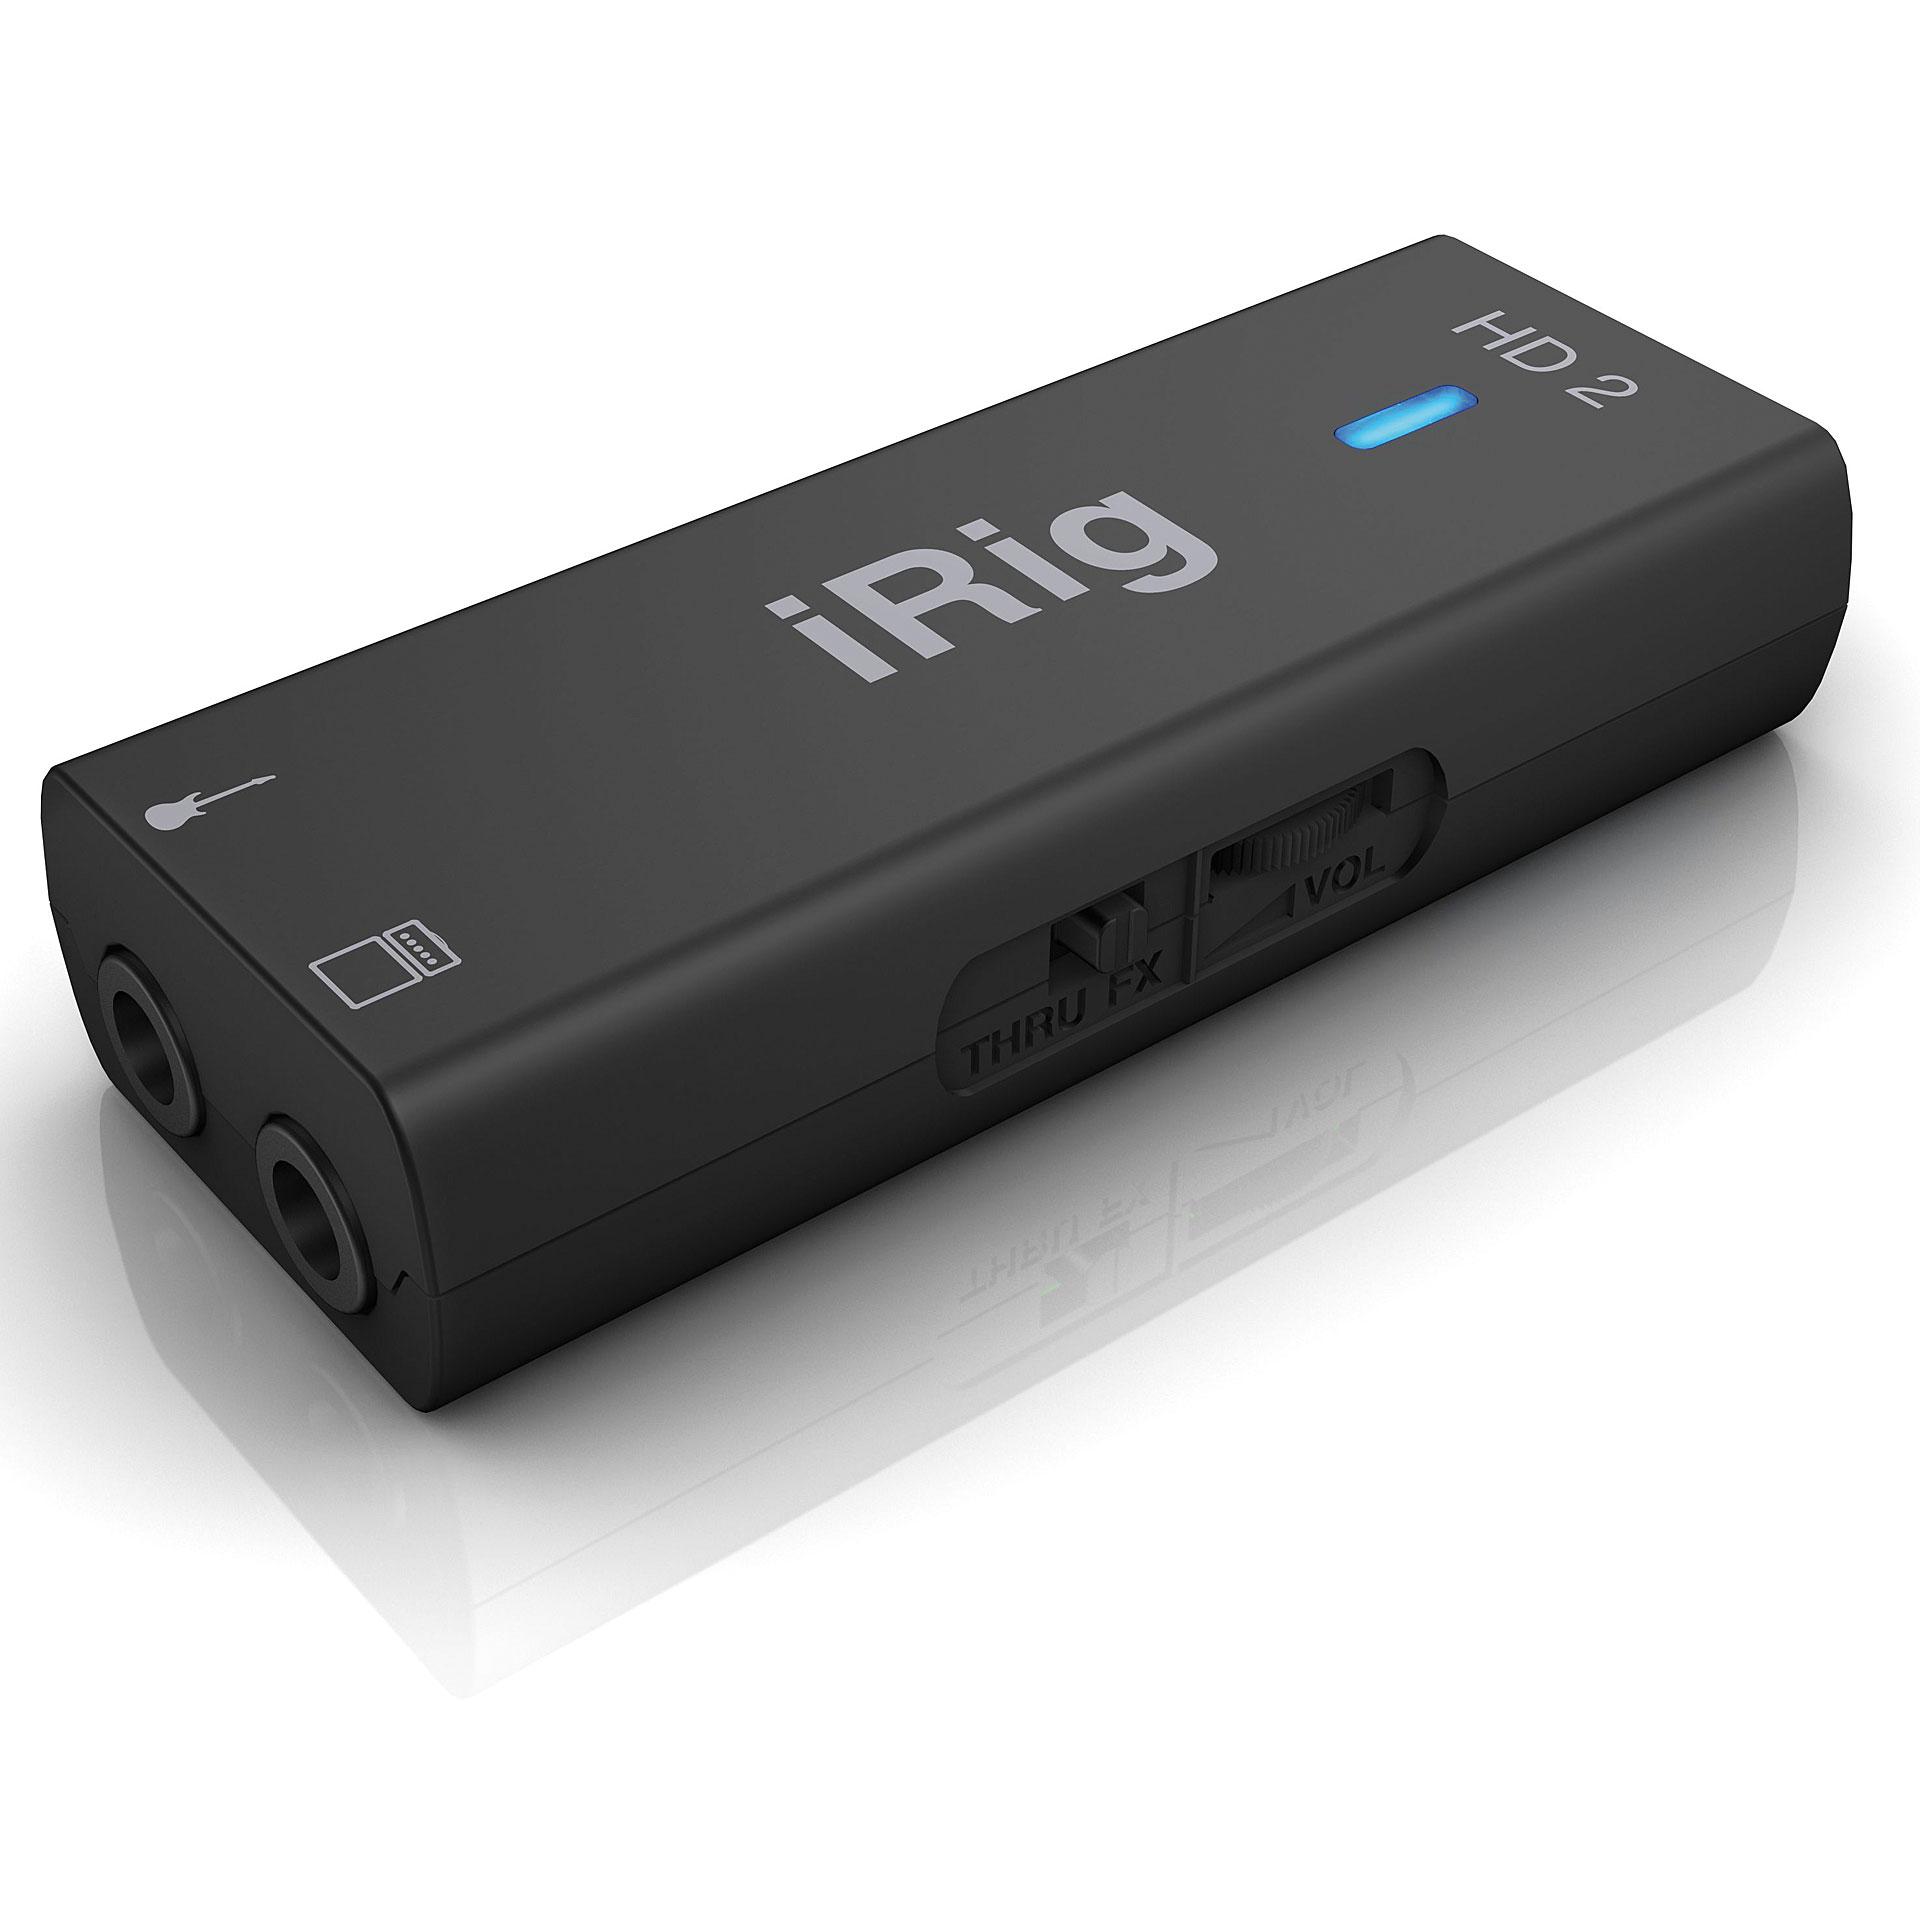 IK-MULTIMEDIA-IRIG2-HD-IRIG-HD-2-INTERFACCIA-AUDIO-MOBILE-sku-16649